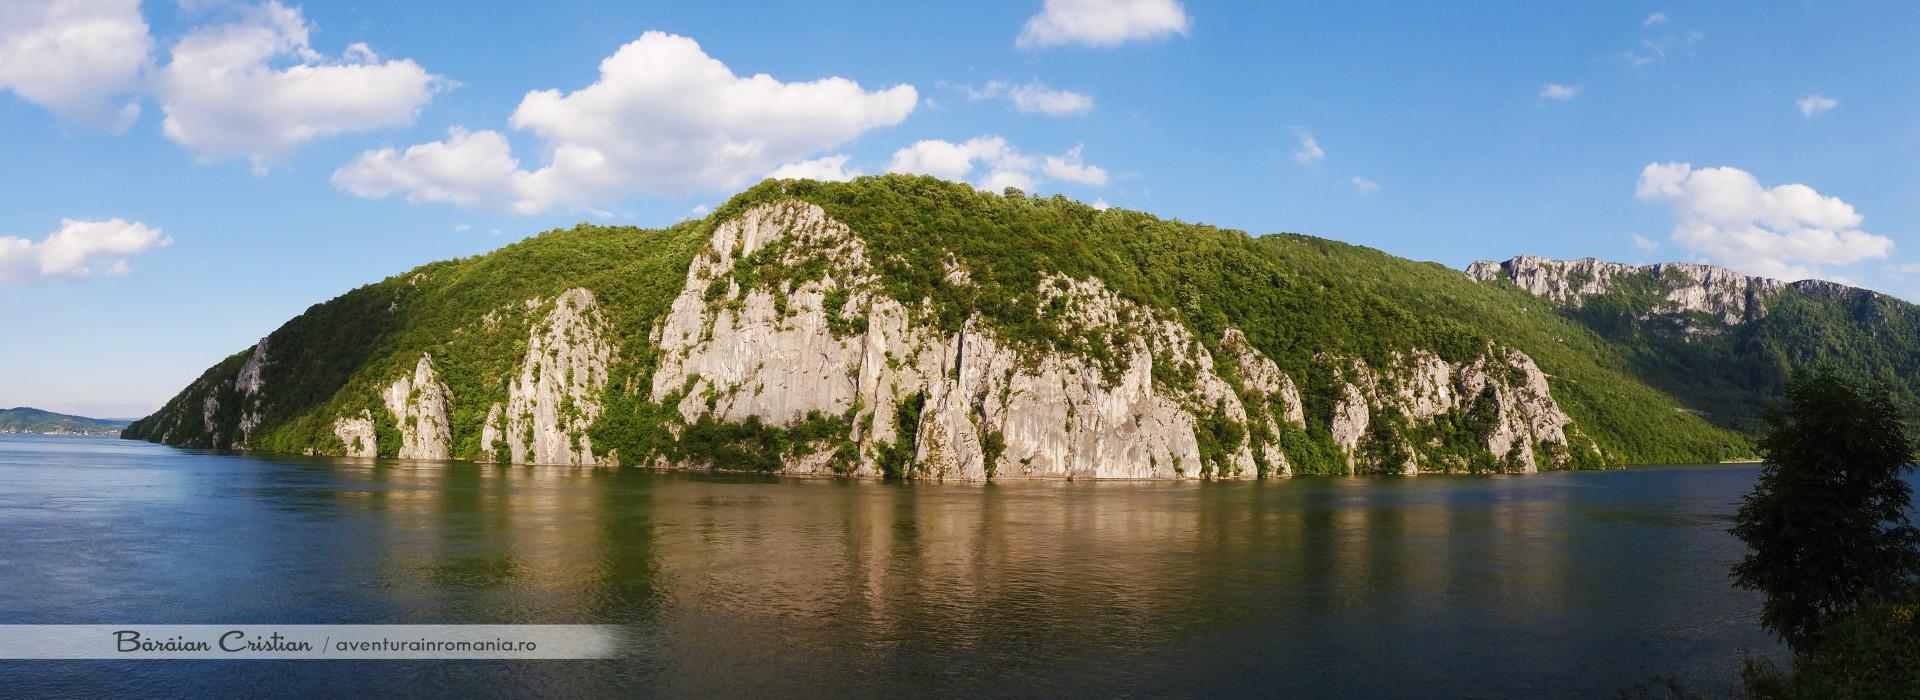 Danube_Aventura in Romania